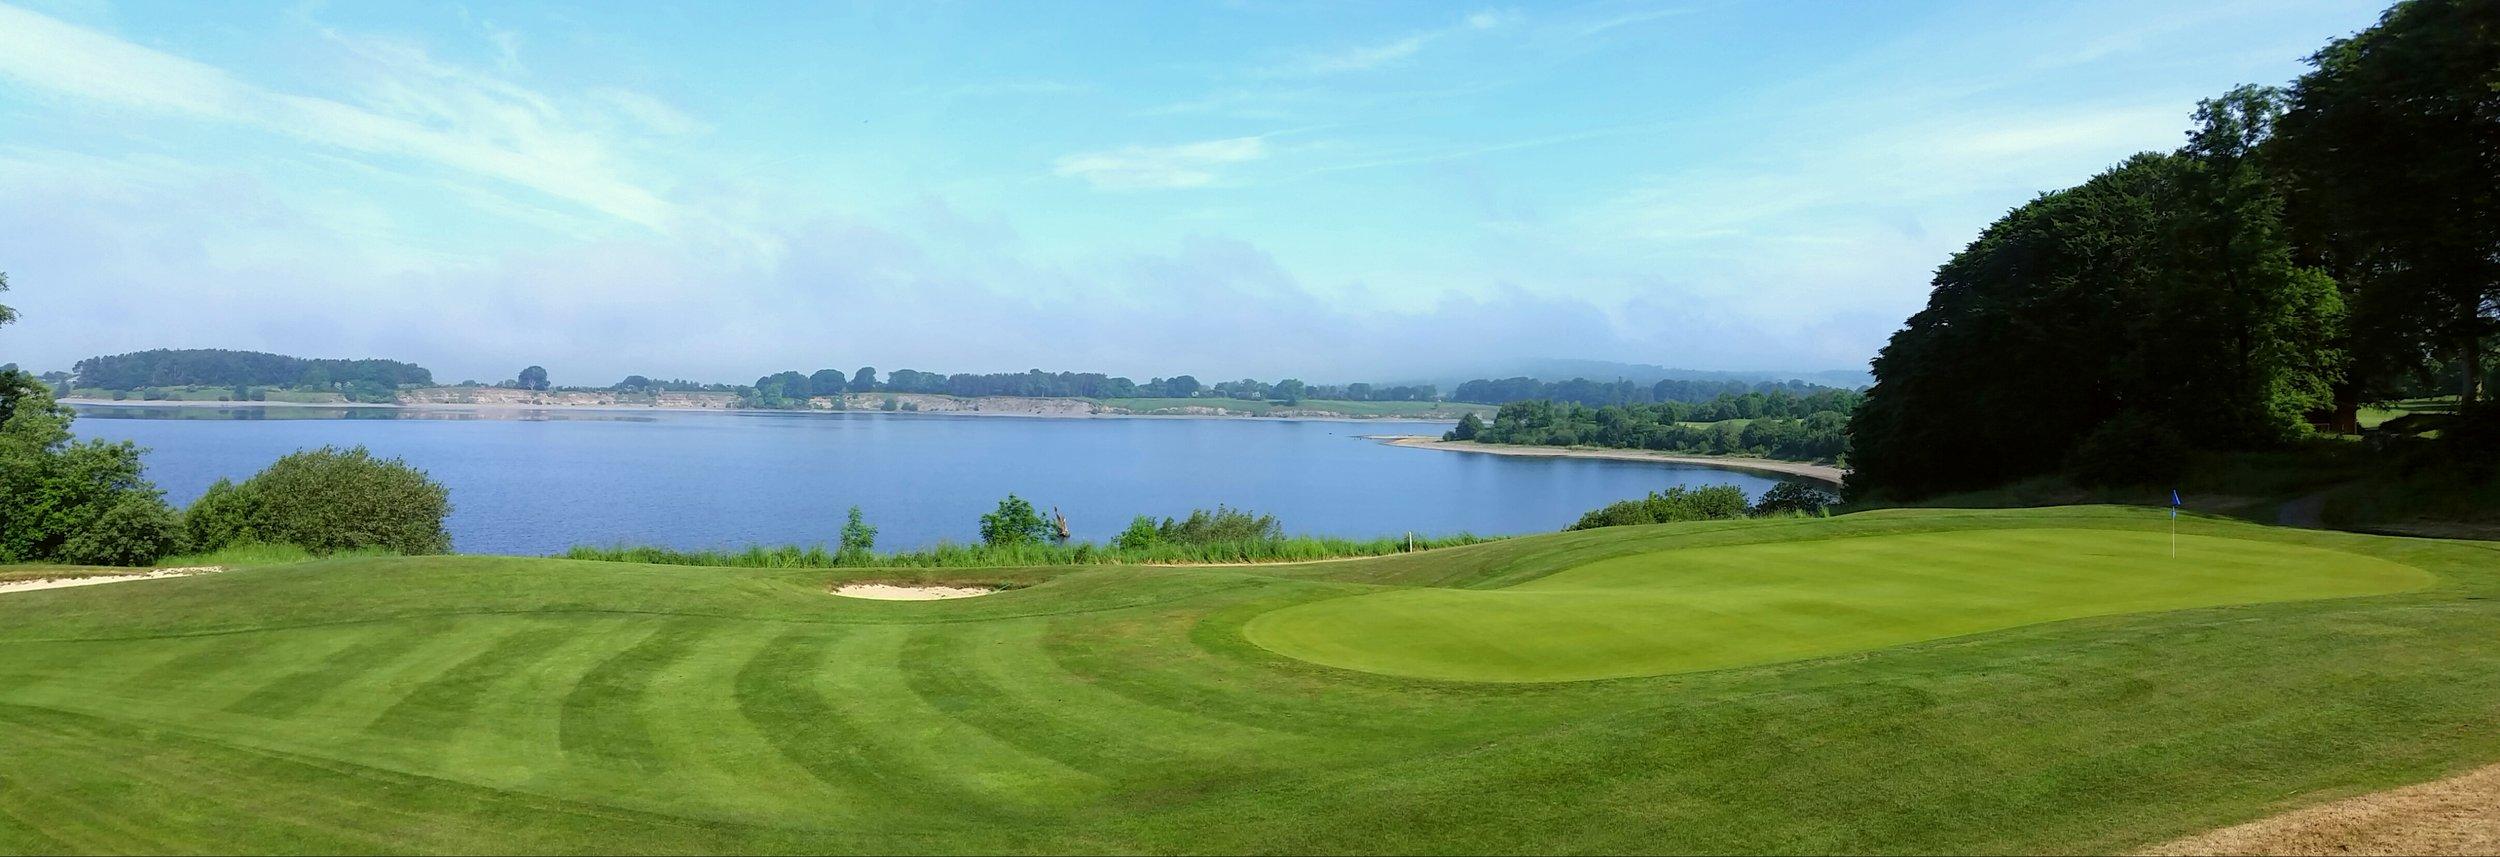 Tulfarris Golf Course